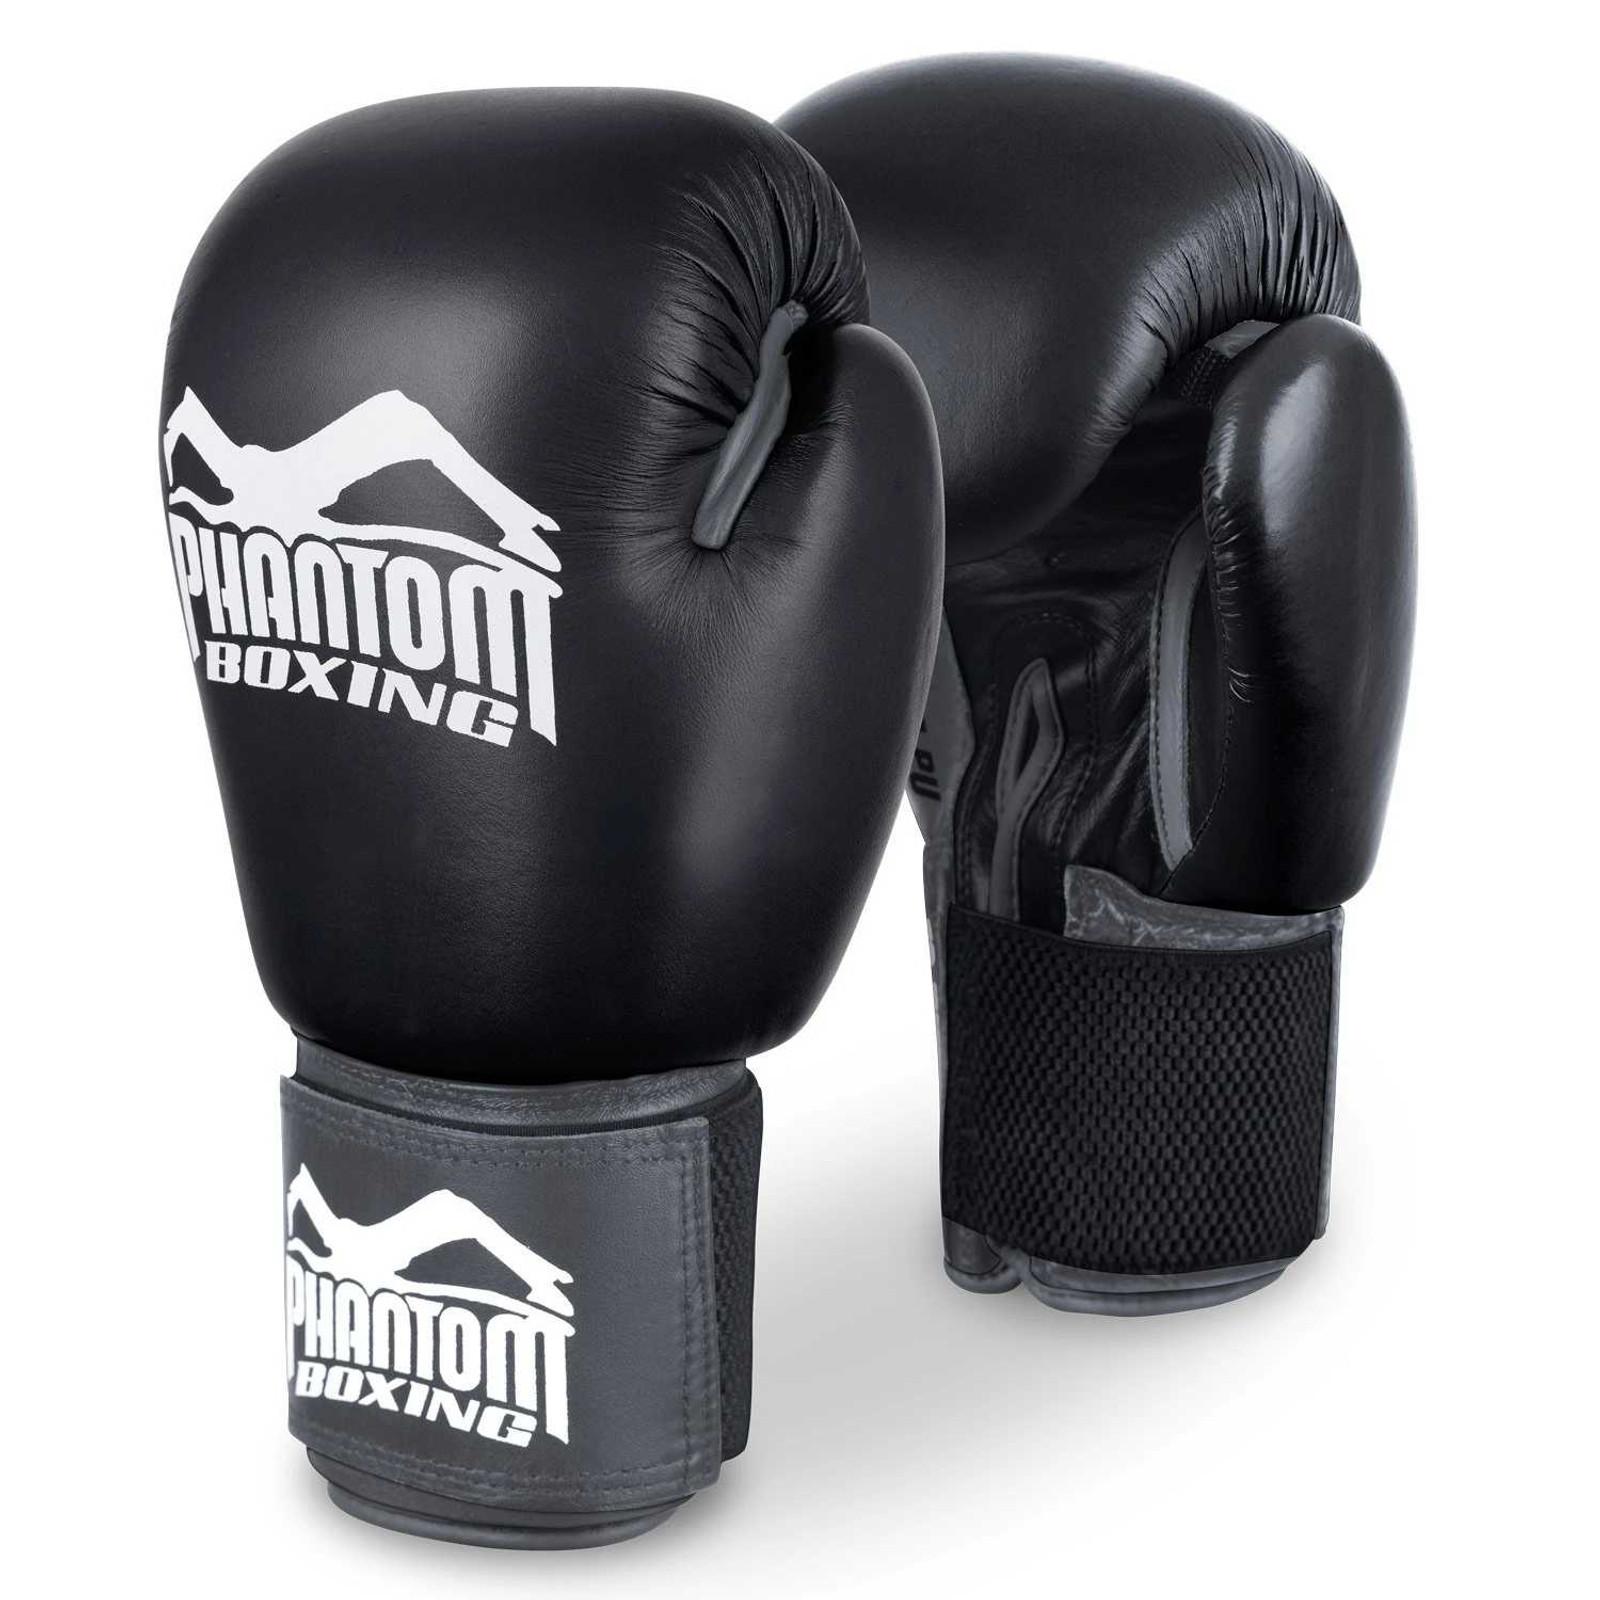 Phantom Athletics Boxhandschuhe Ultra